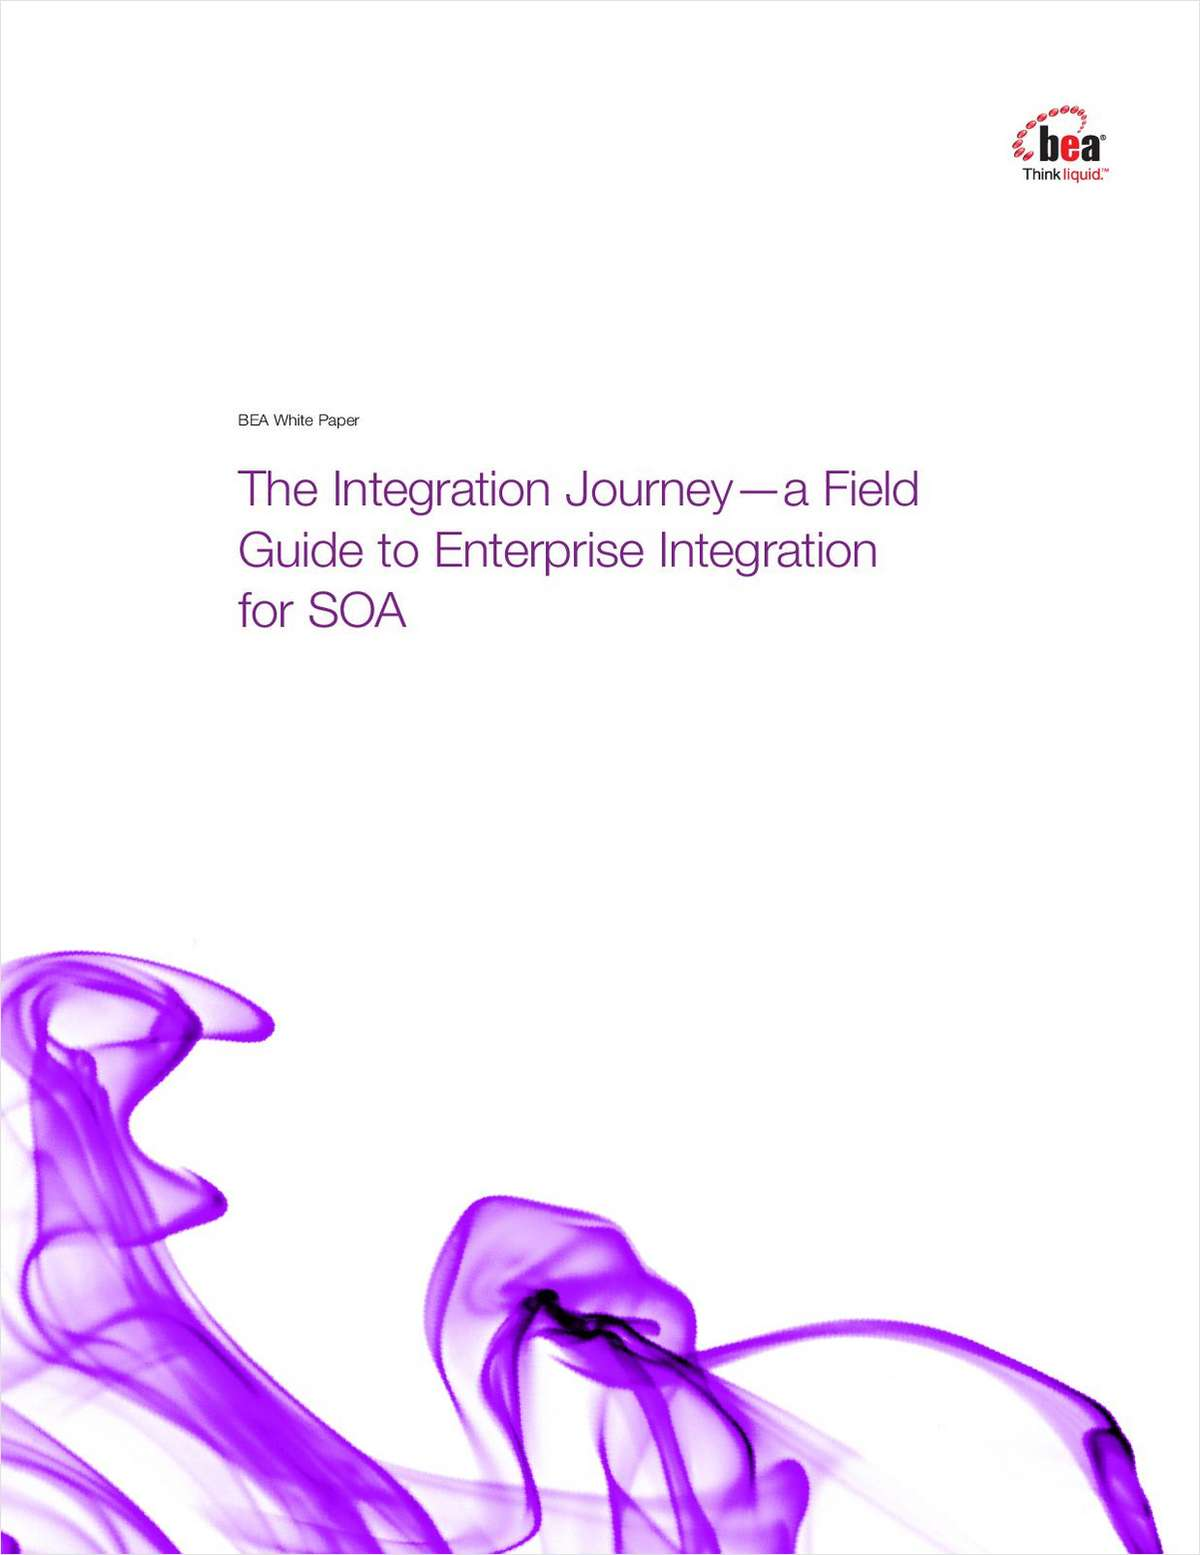 The Integration Journey—a Field Guide to Enterprise Integration for SOA